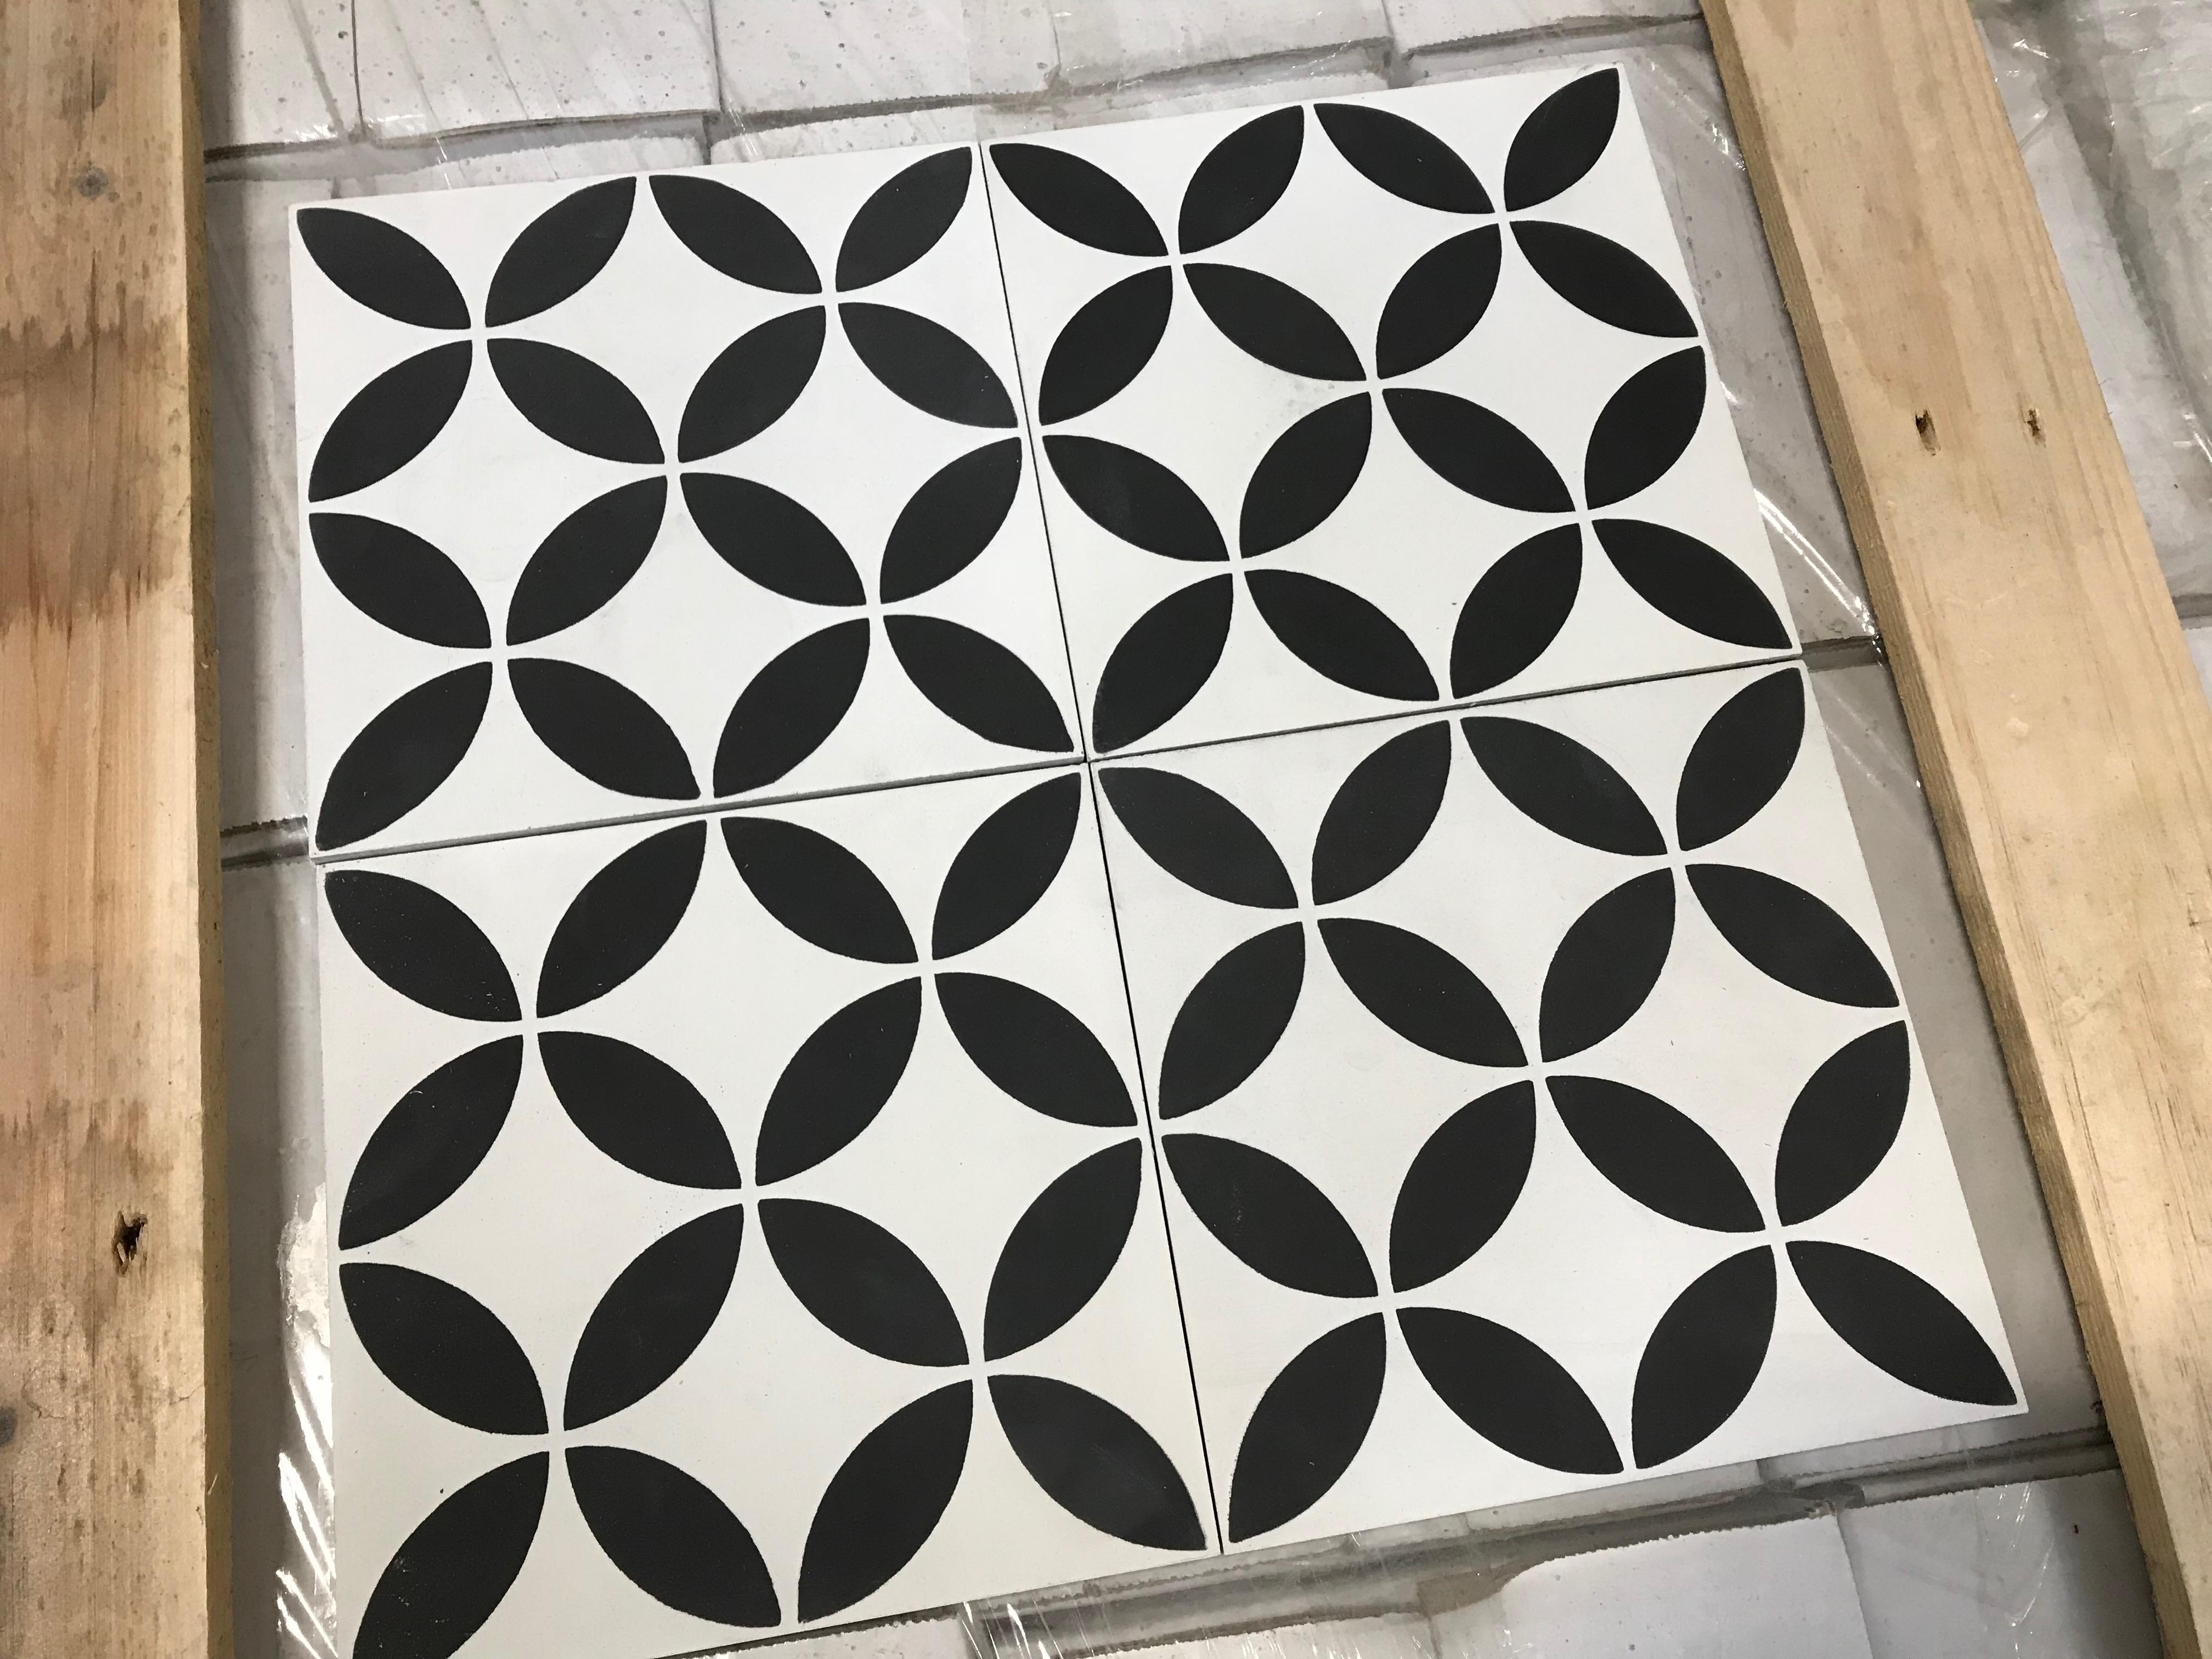 Handmade Encaustic Cement Tiles Circles Black Design The